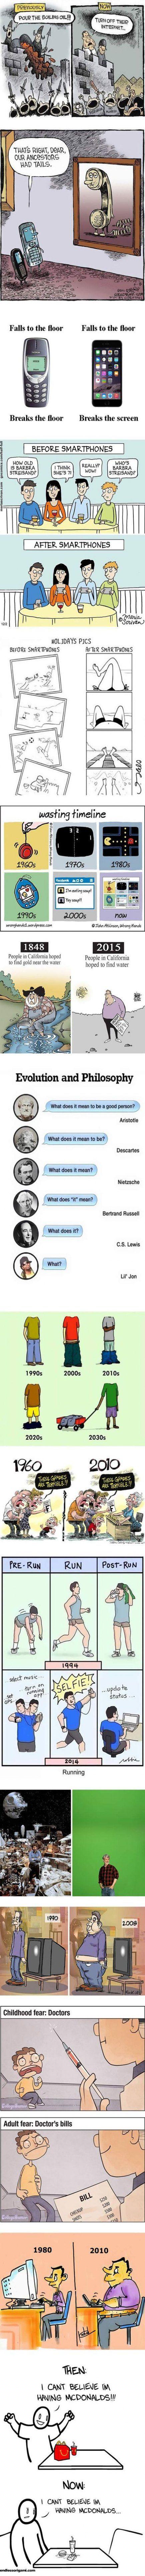 16 Ideas Funny Ilustrations Comedy Lol